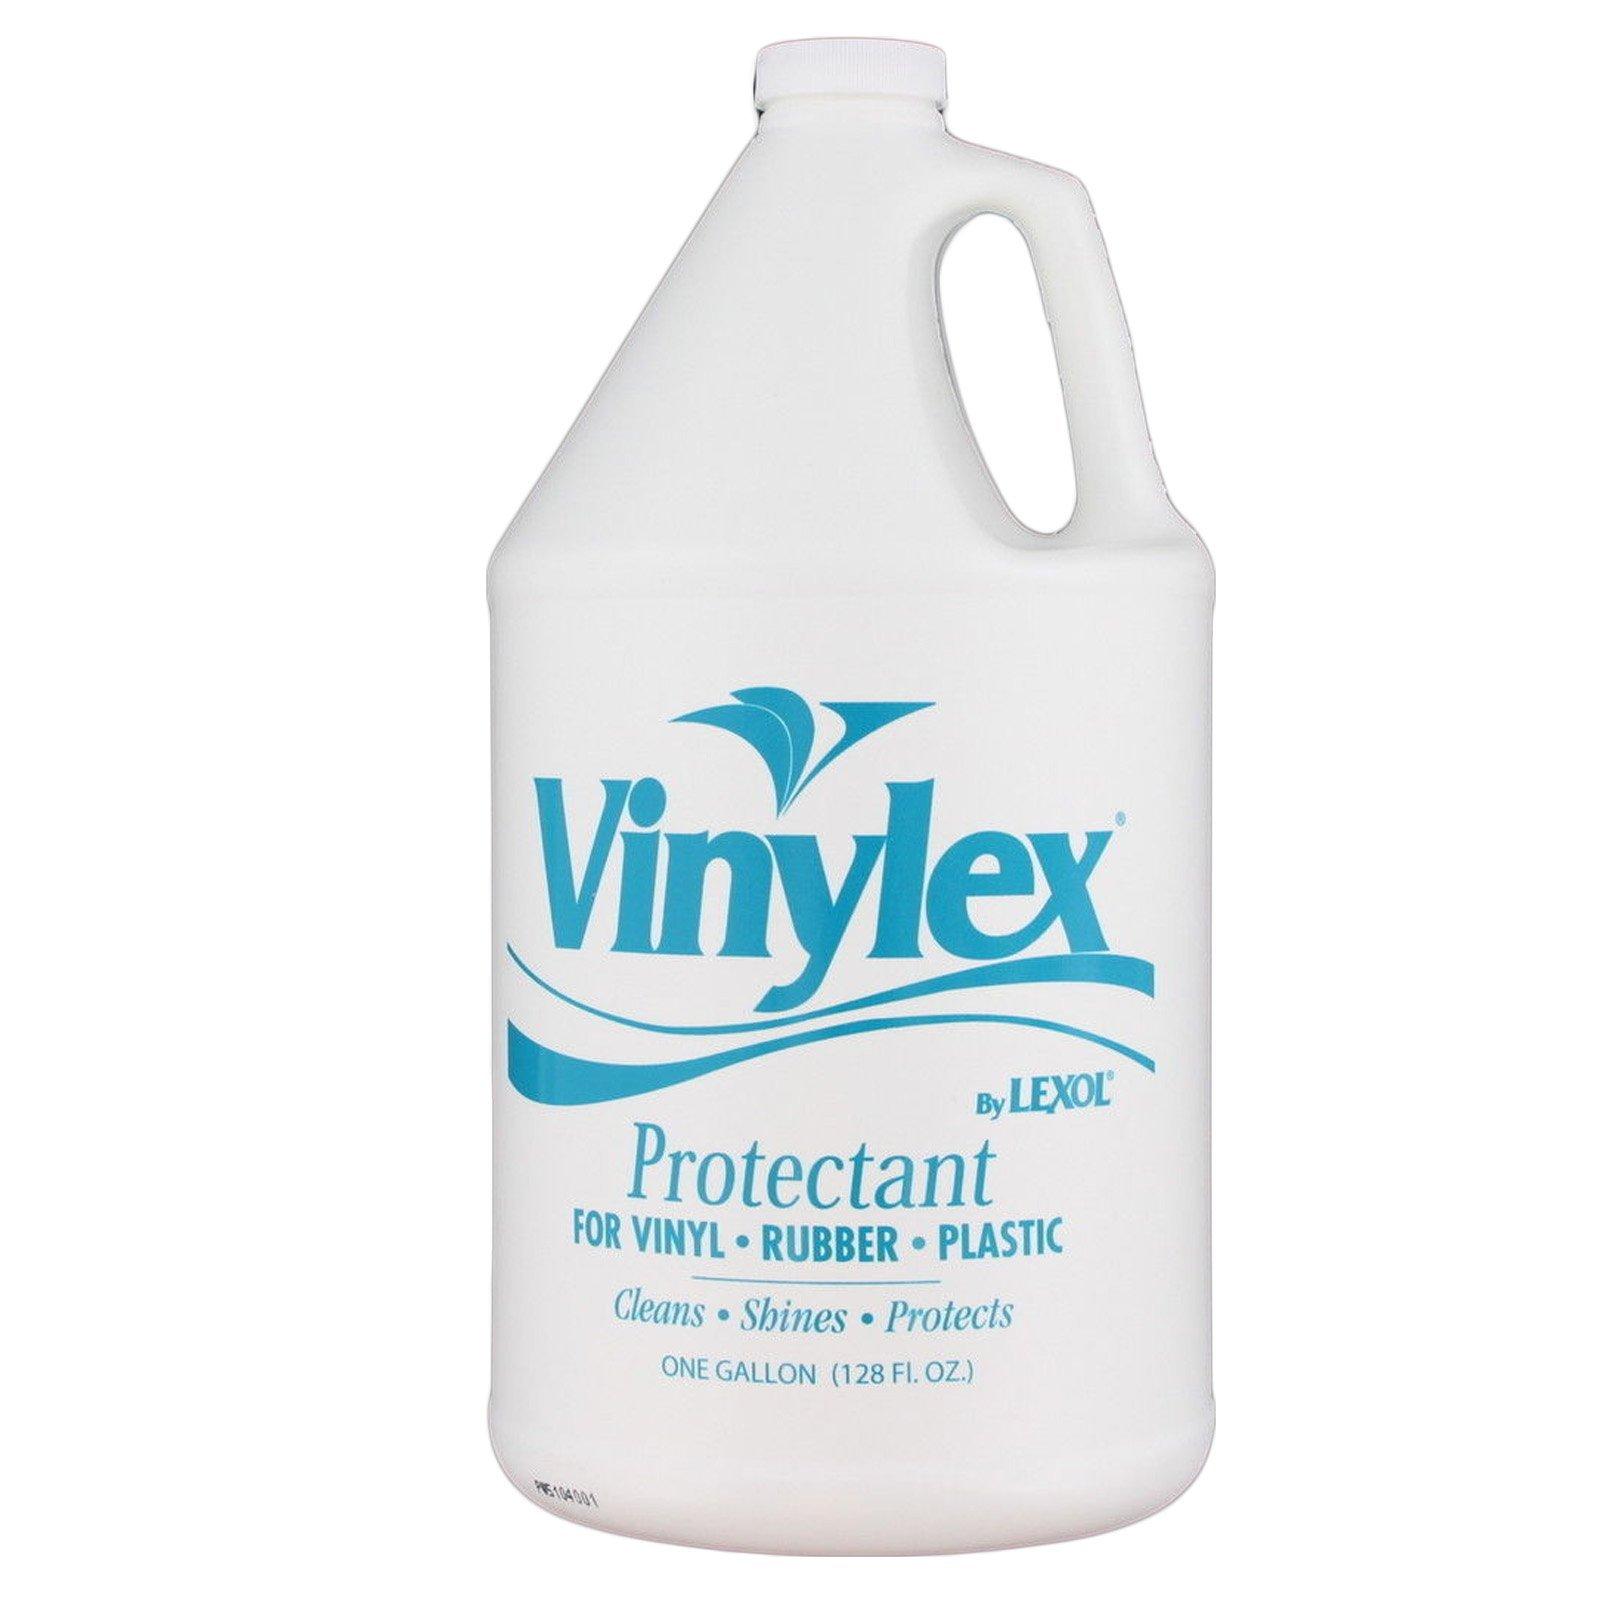 Vinylex Lexol Protectant Rubber Plastic Vinyl Cleaner Interior Exterior Car Truck RV Boat Detail 1 Gallon